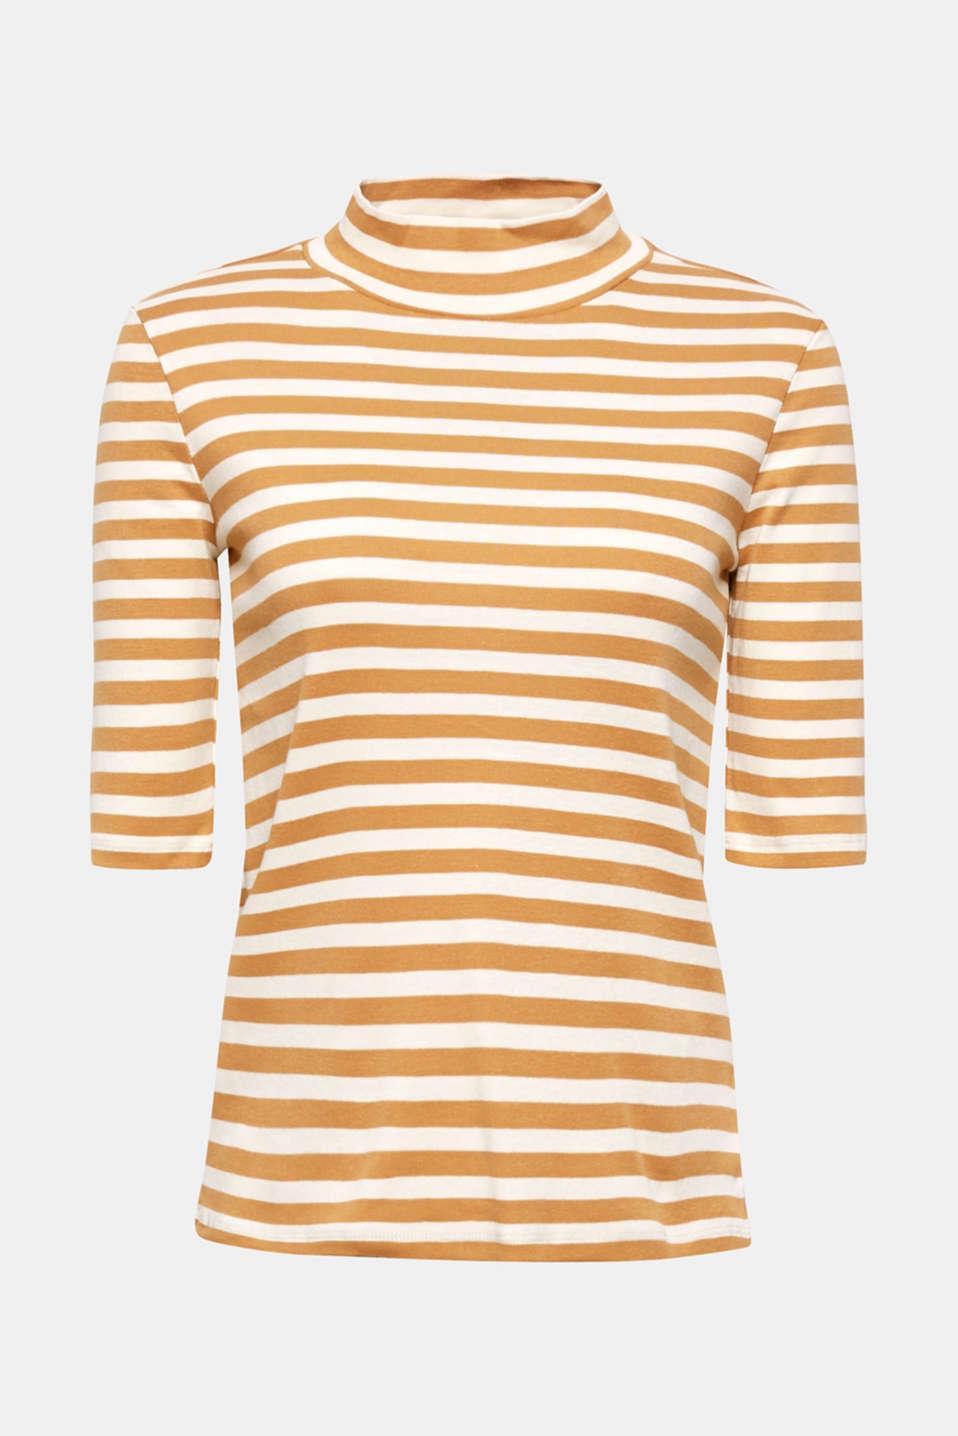 T-Shirts, CAMEL, detail image number 7